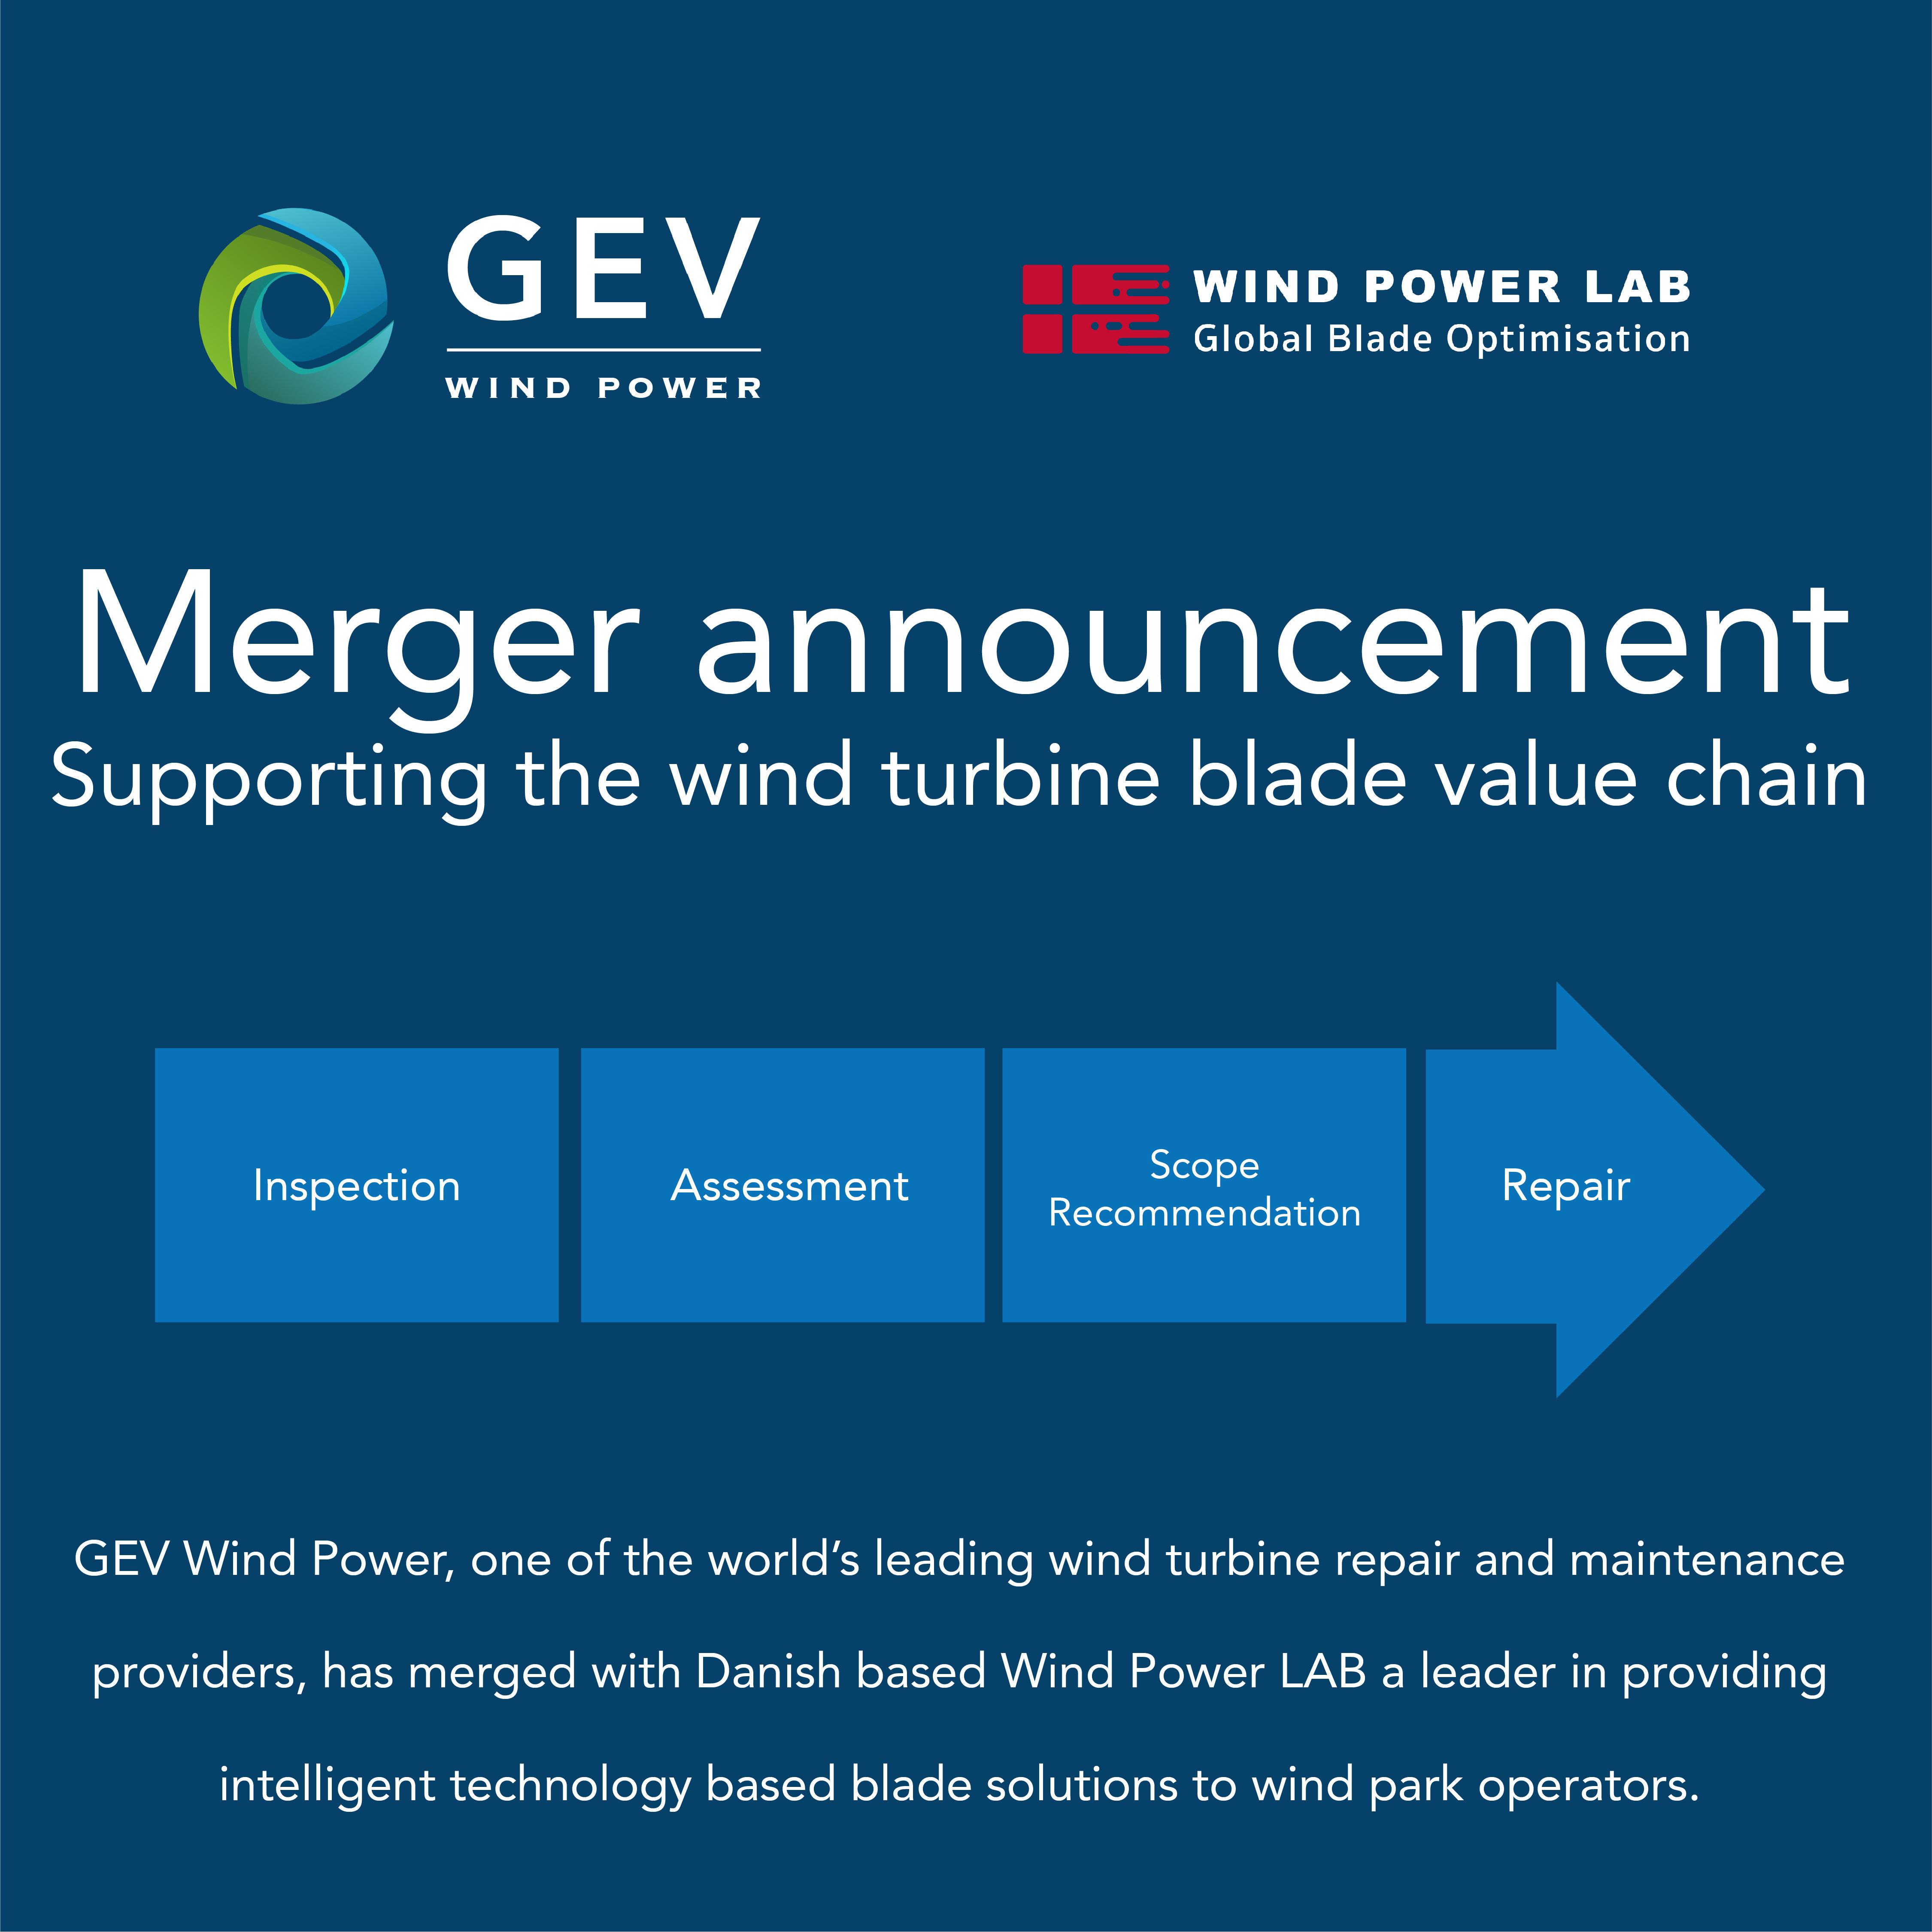 GEV Wind Power Merger Announcement